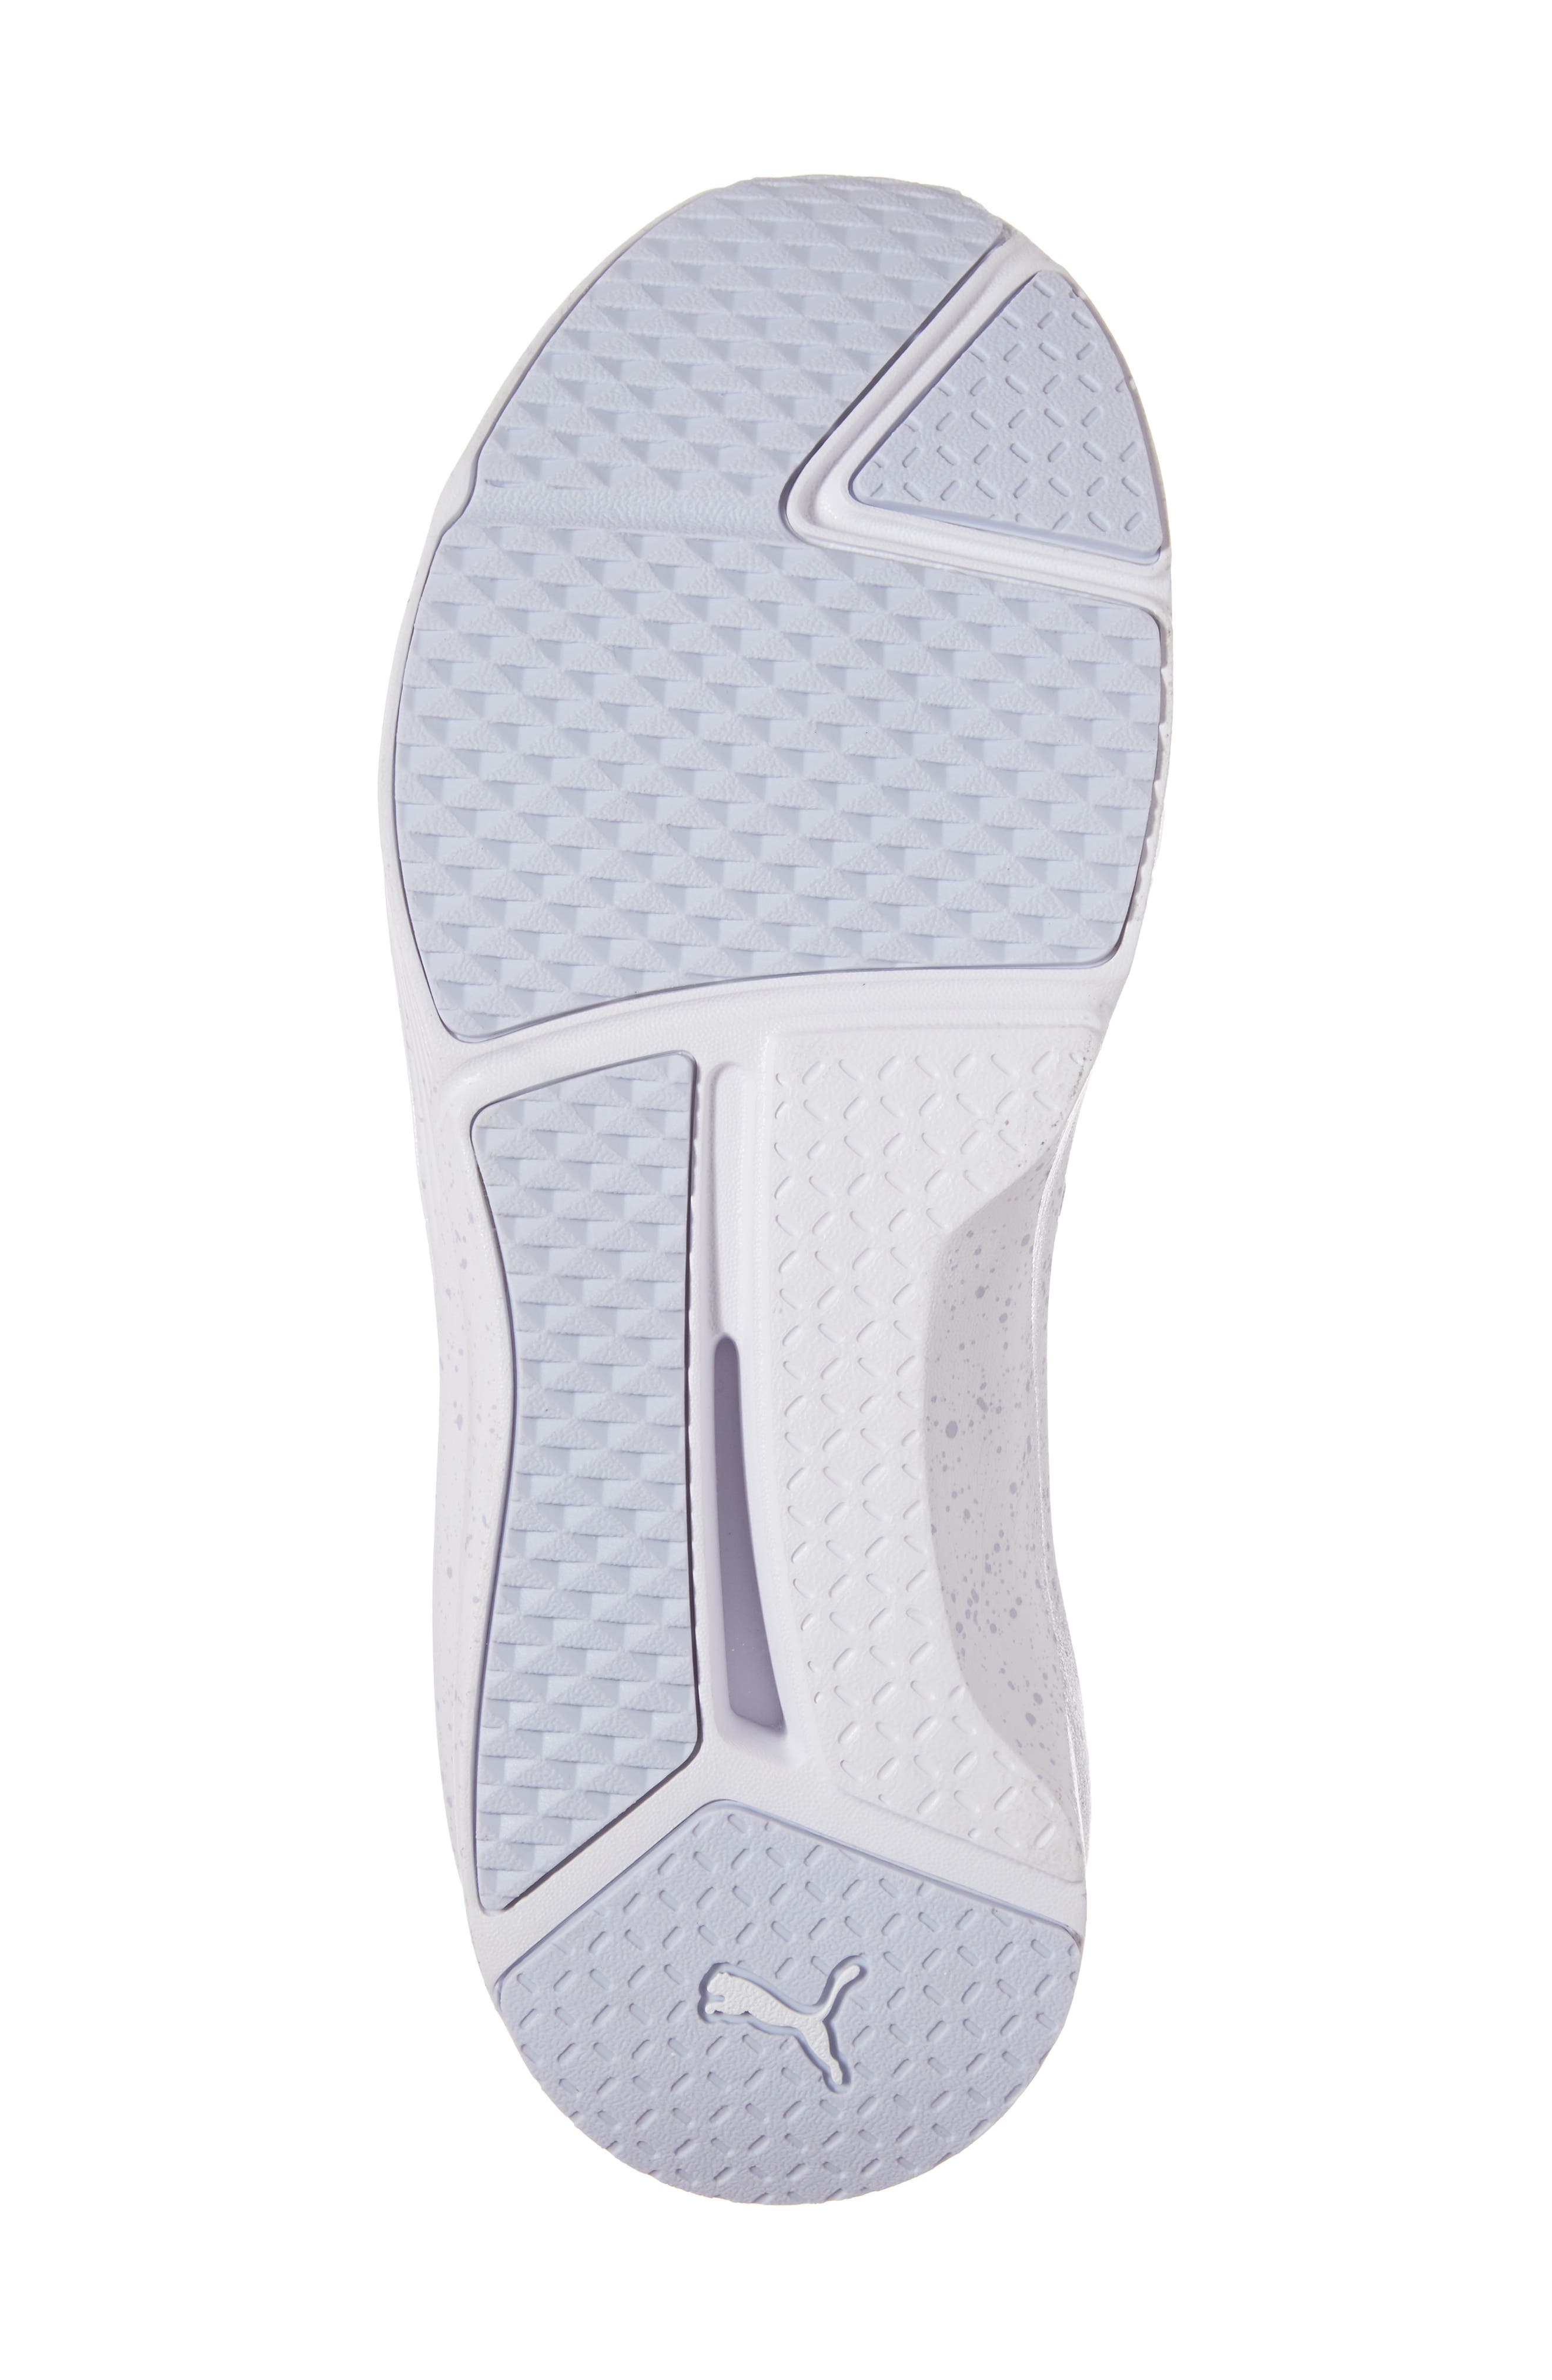 Fierce Bleached High Top Sneaker,                             Alternate thumbnail 6, color,                             400